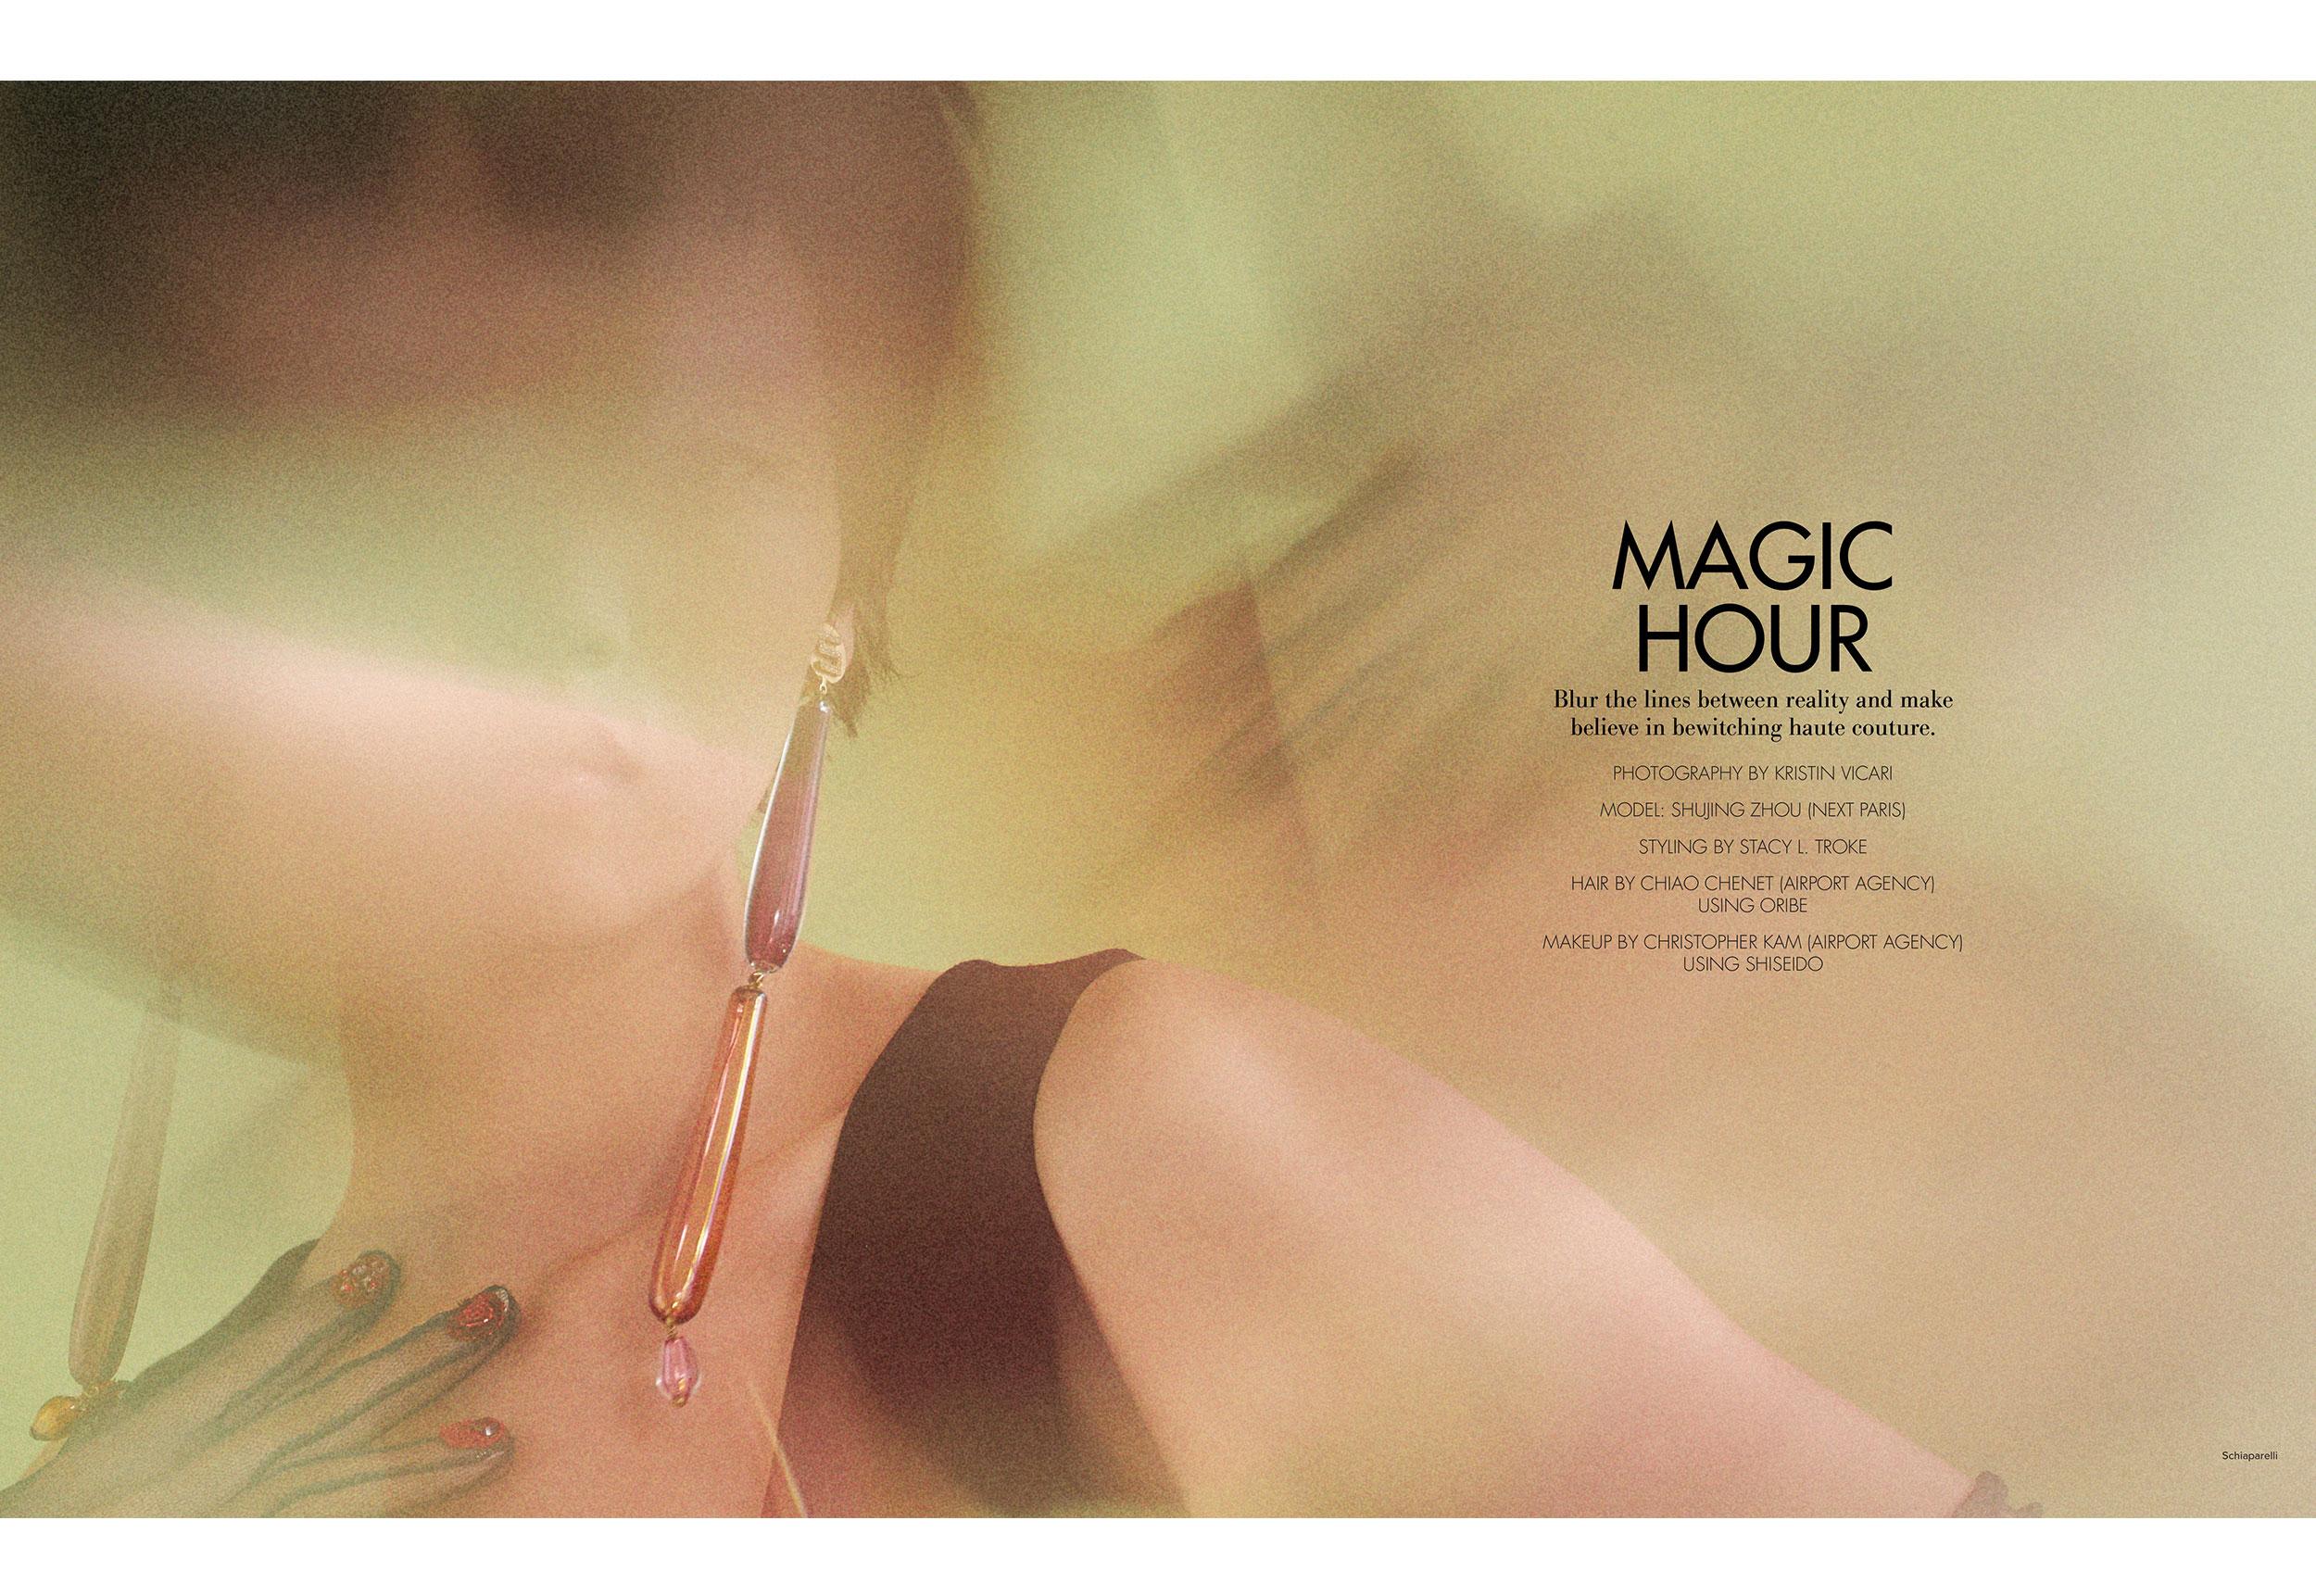 Stacy_Troke_Magic_Hour_1.jpg